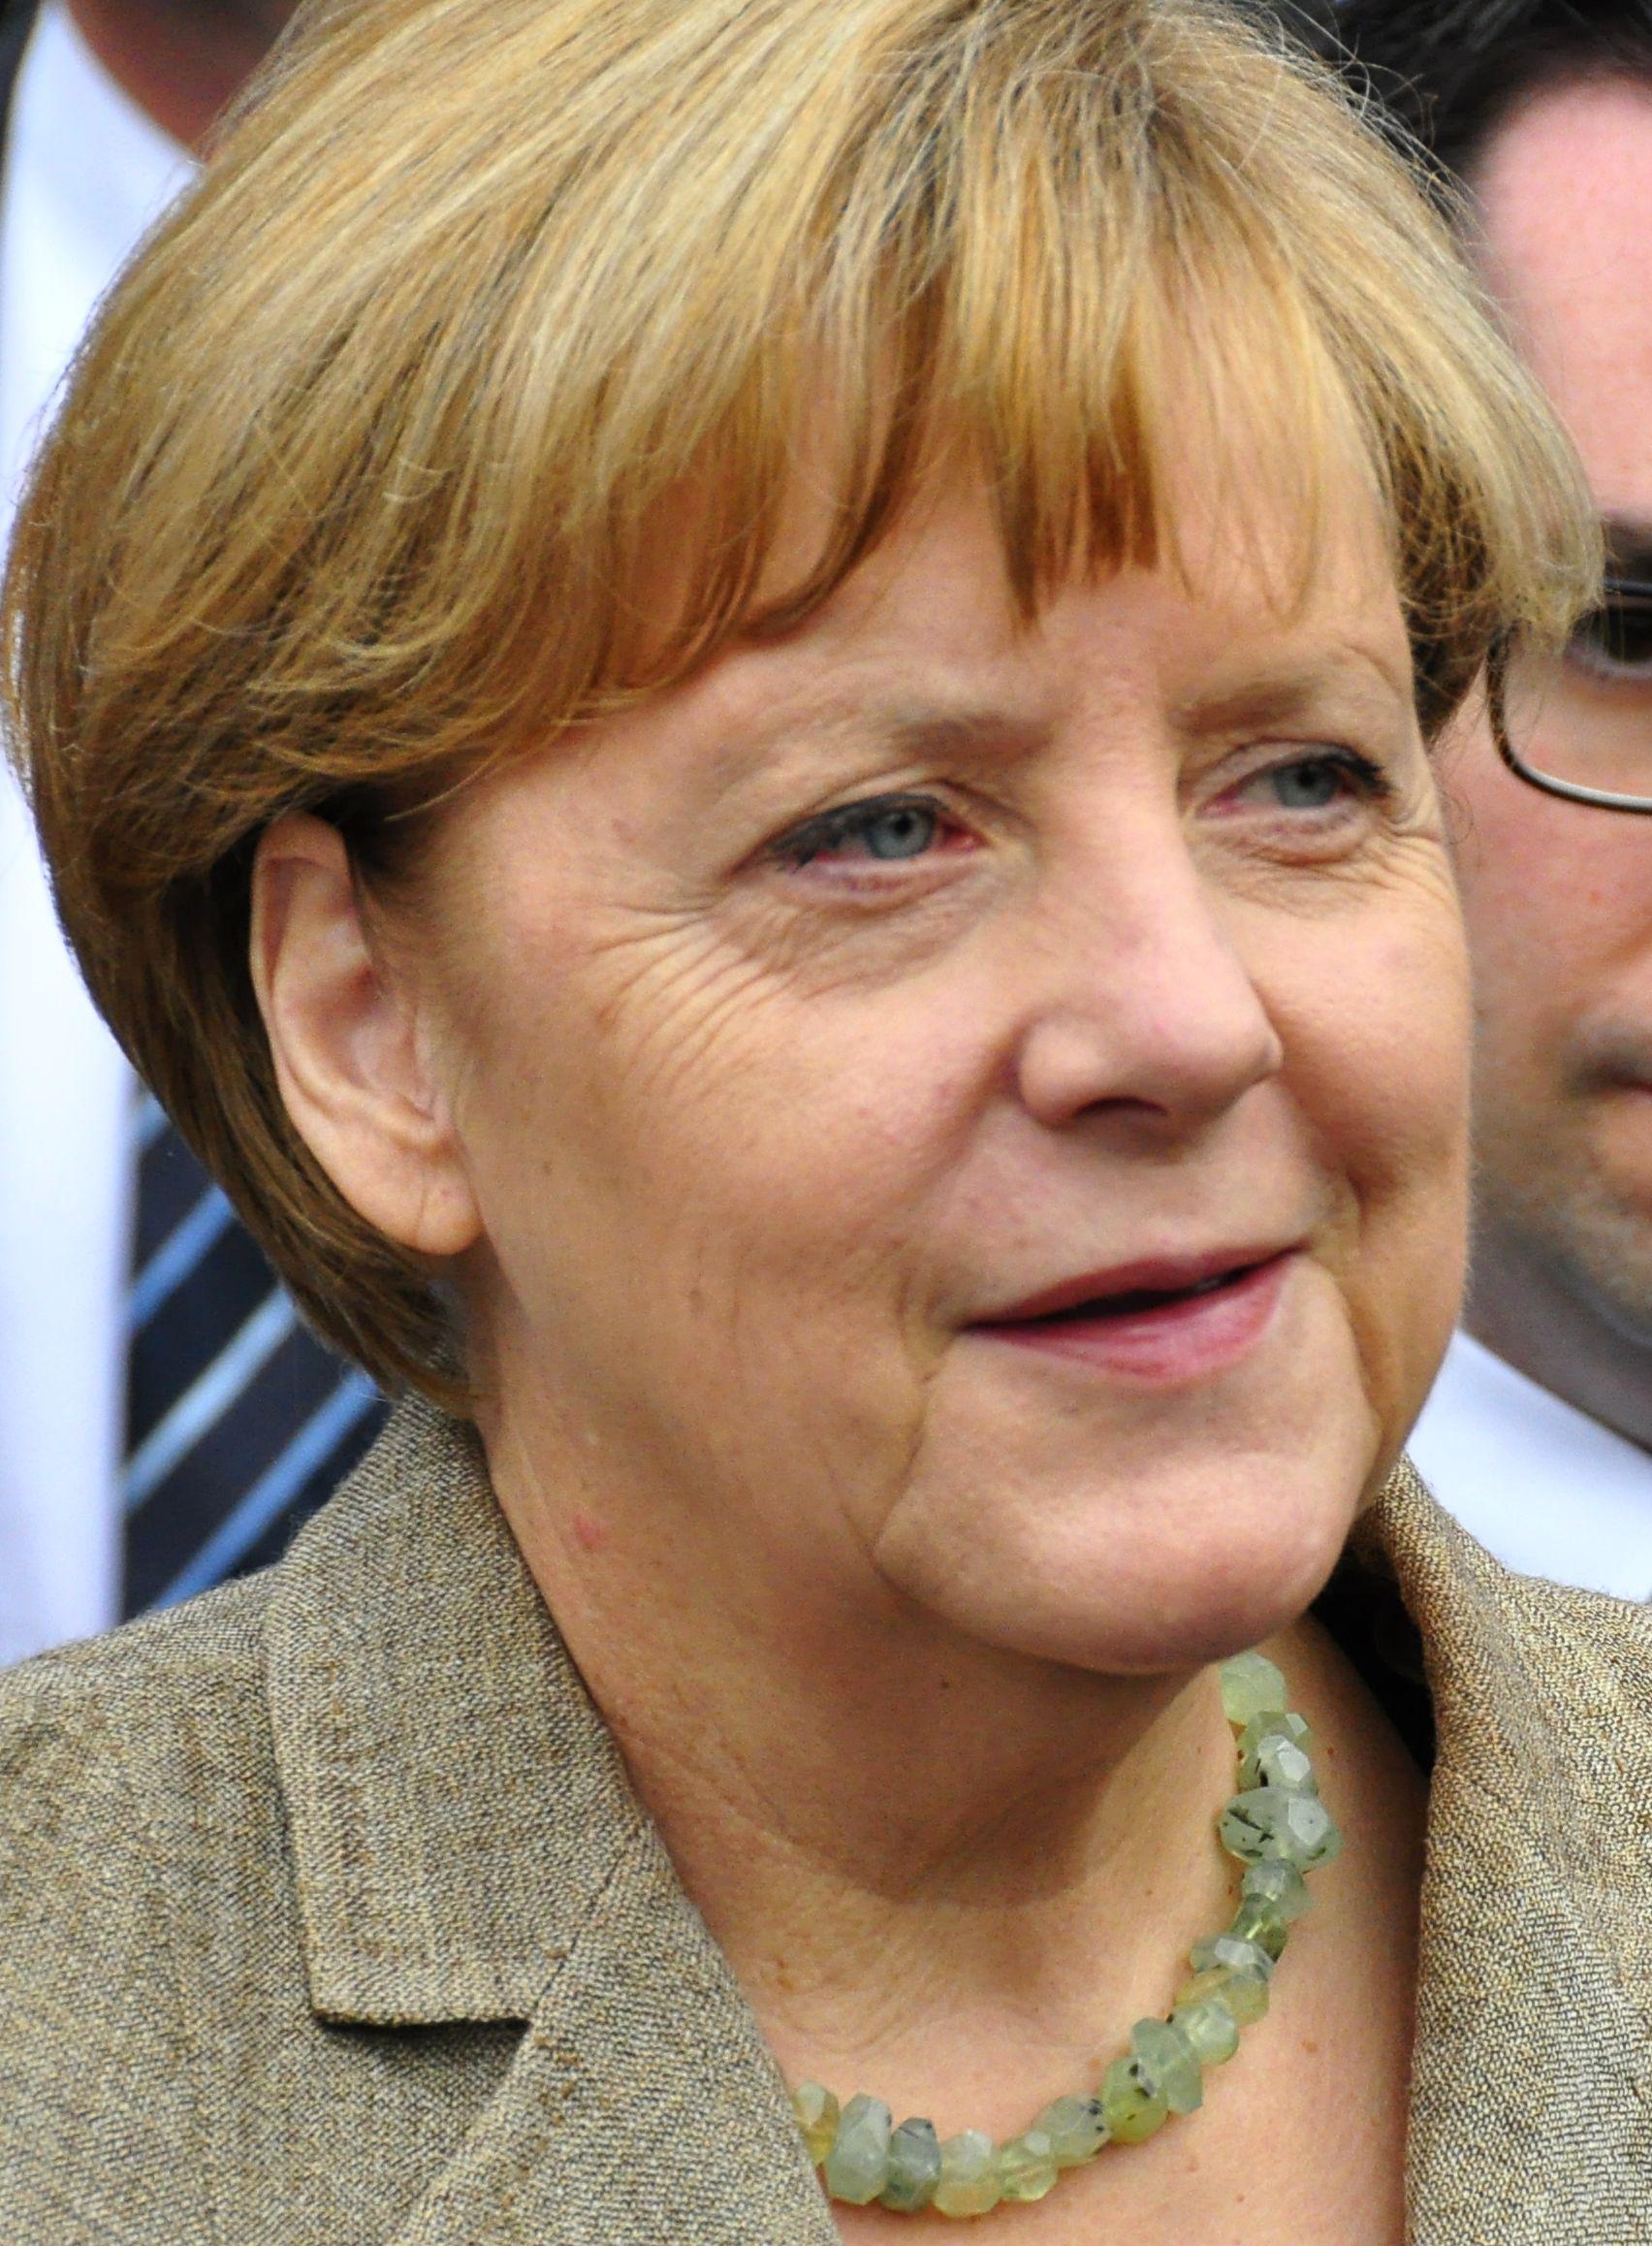 Angela Merkel, Bundeskanzlerin seit 2005